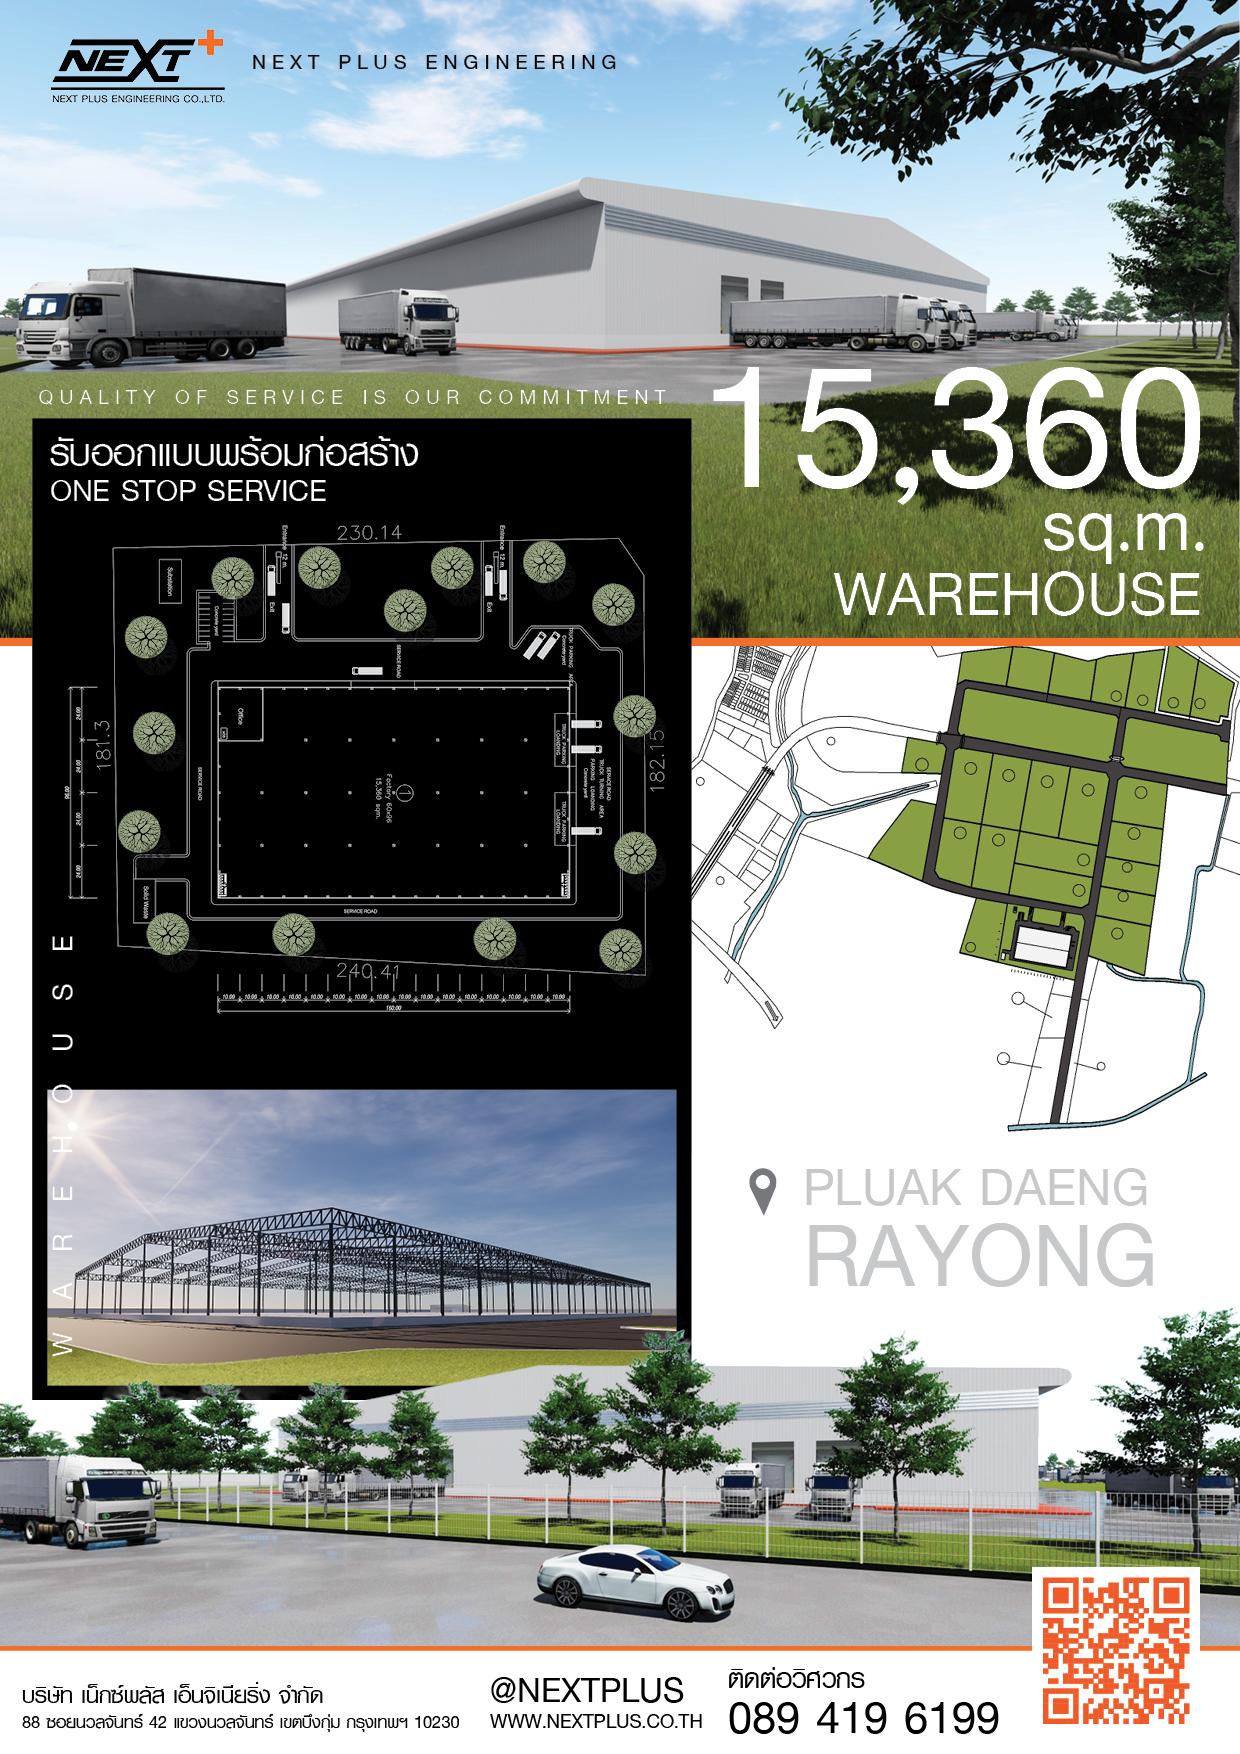 Warehouse Design Construction_Next Plus Engineering